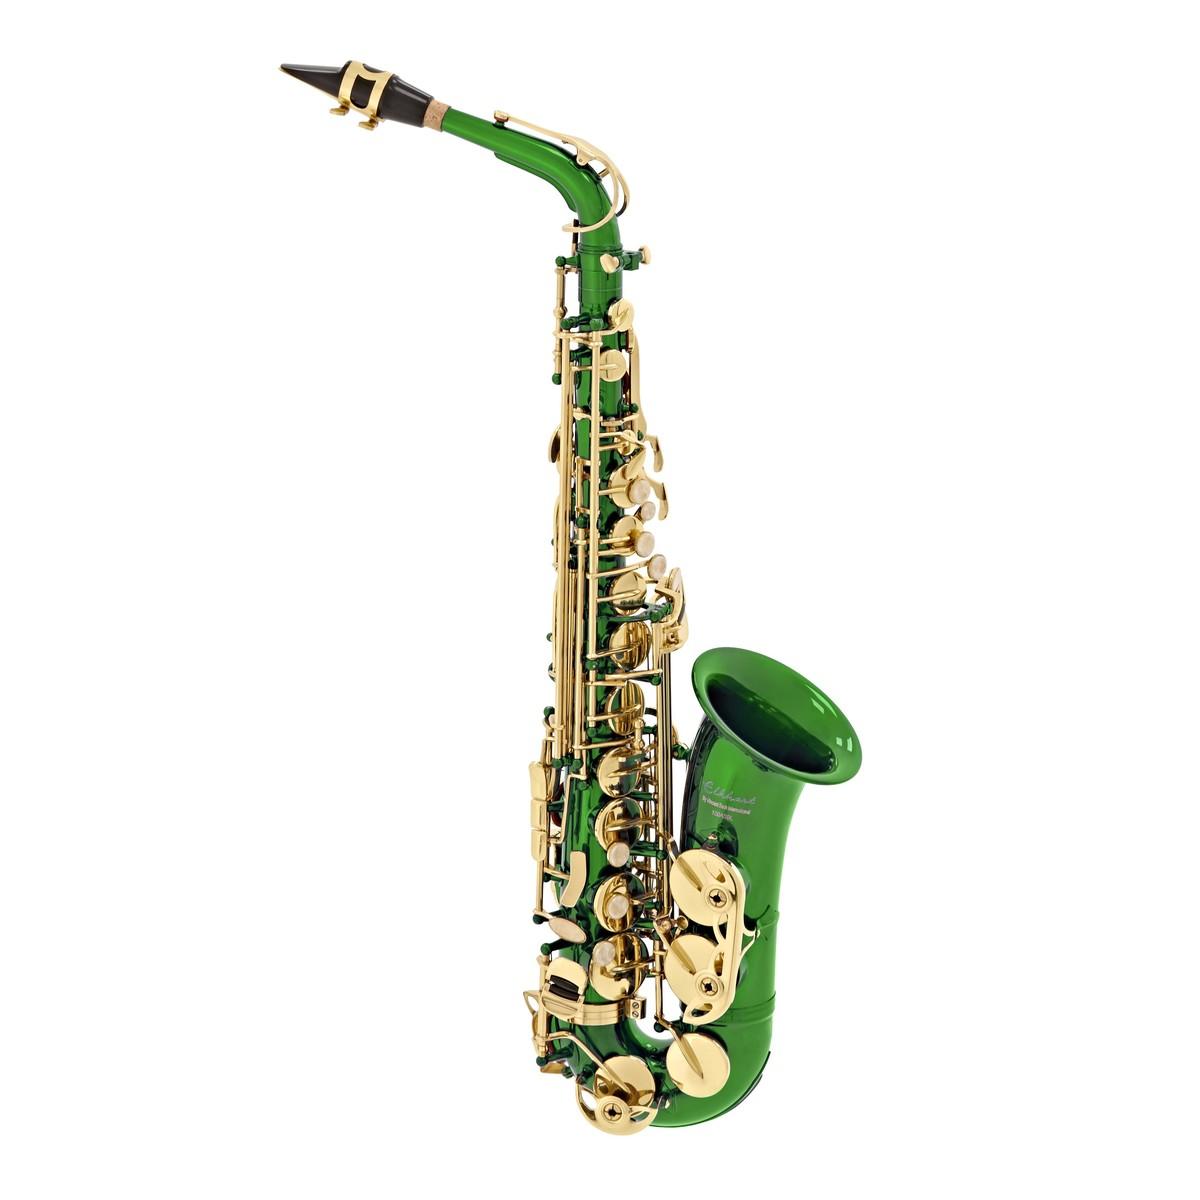 Elkhart 100AS Student Alto Saxophone, Green at Gear4music